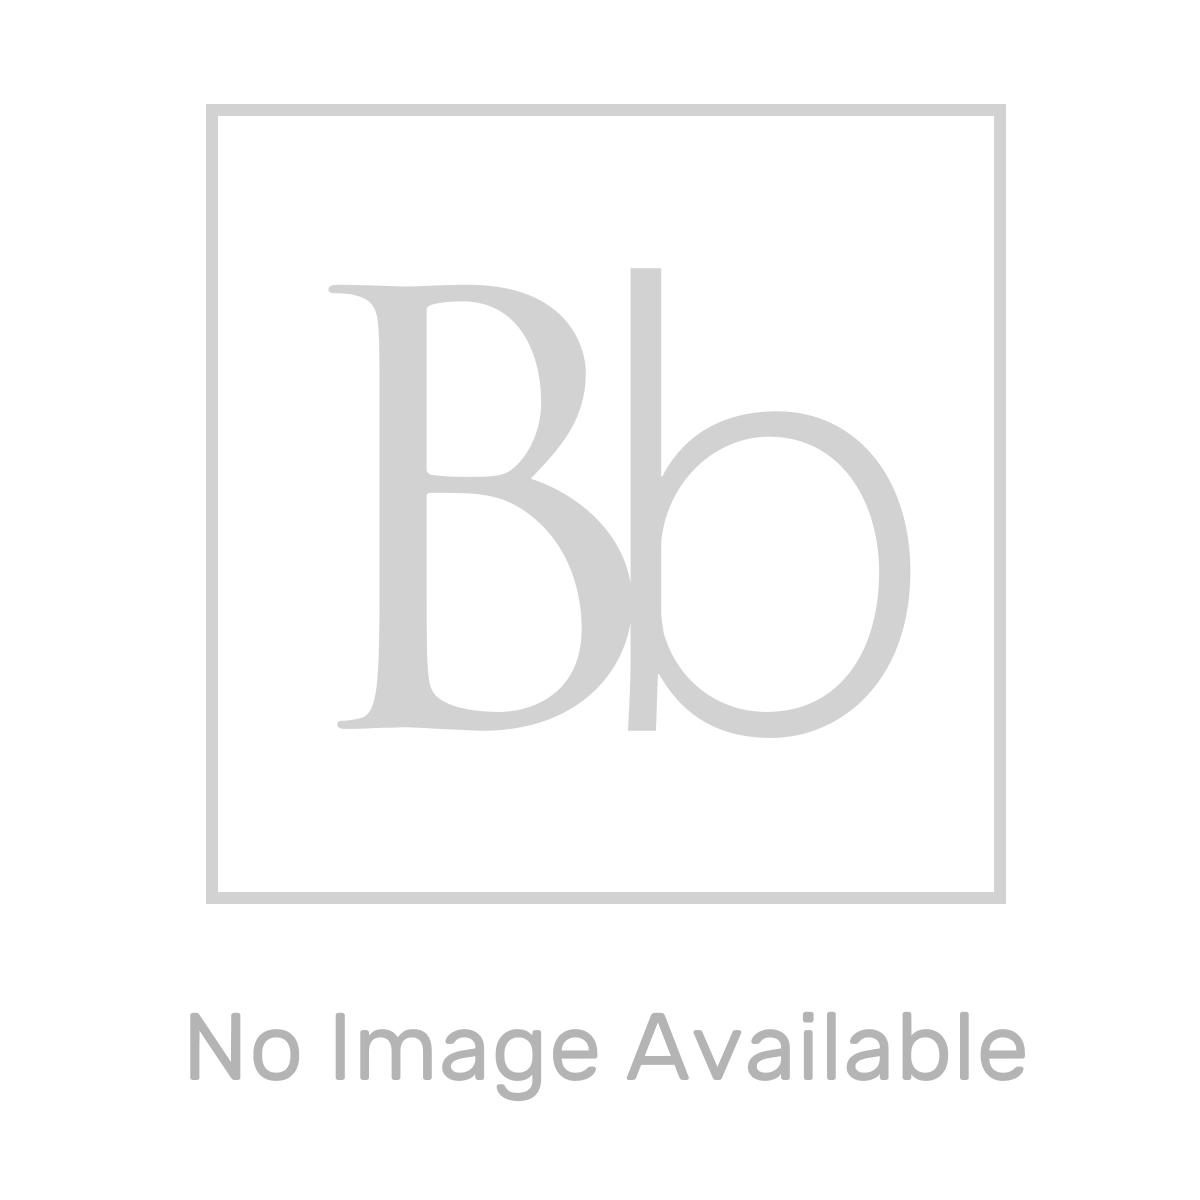 RAK Series 600 Toilet and 400 Series Medium Oak Vanity Unit Front